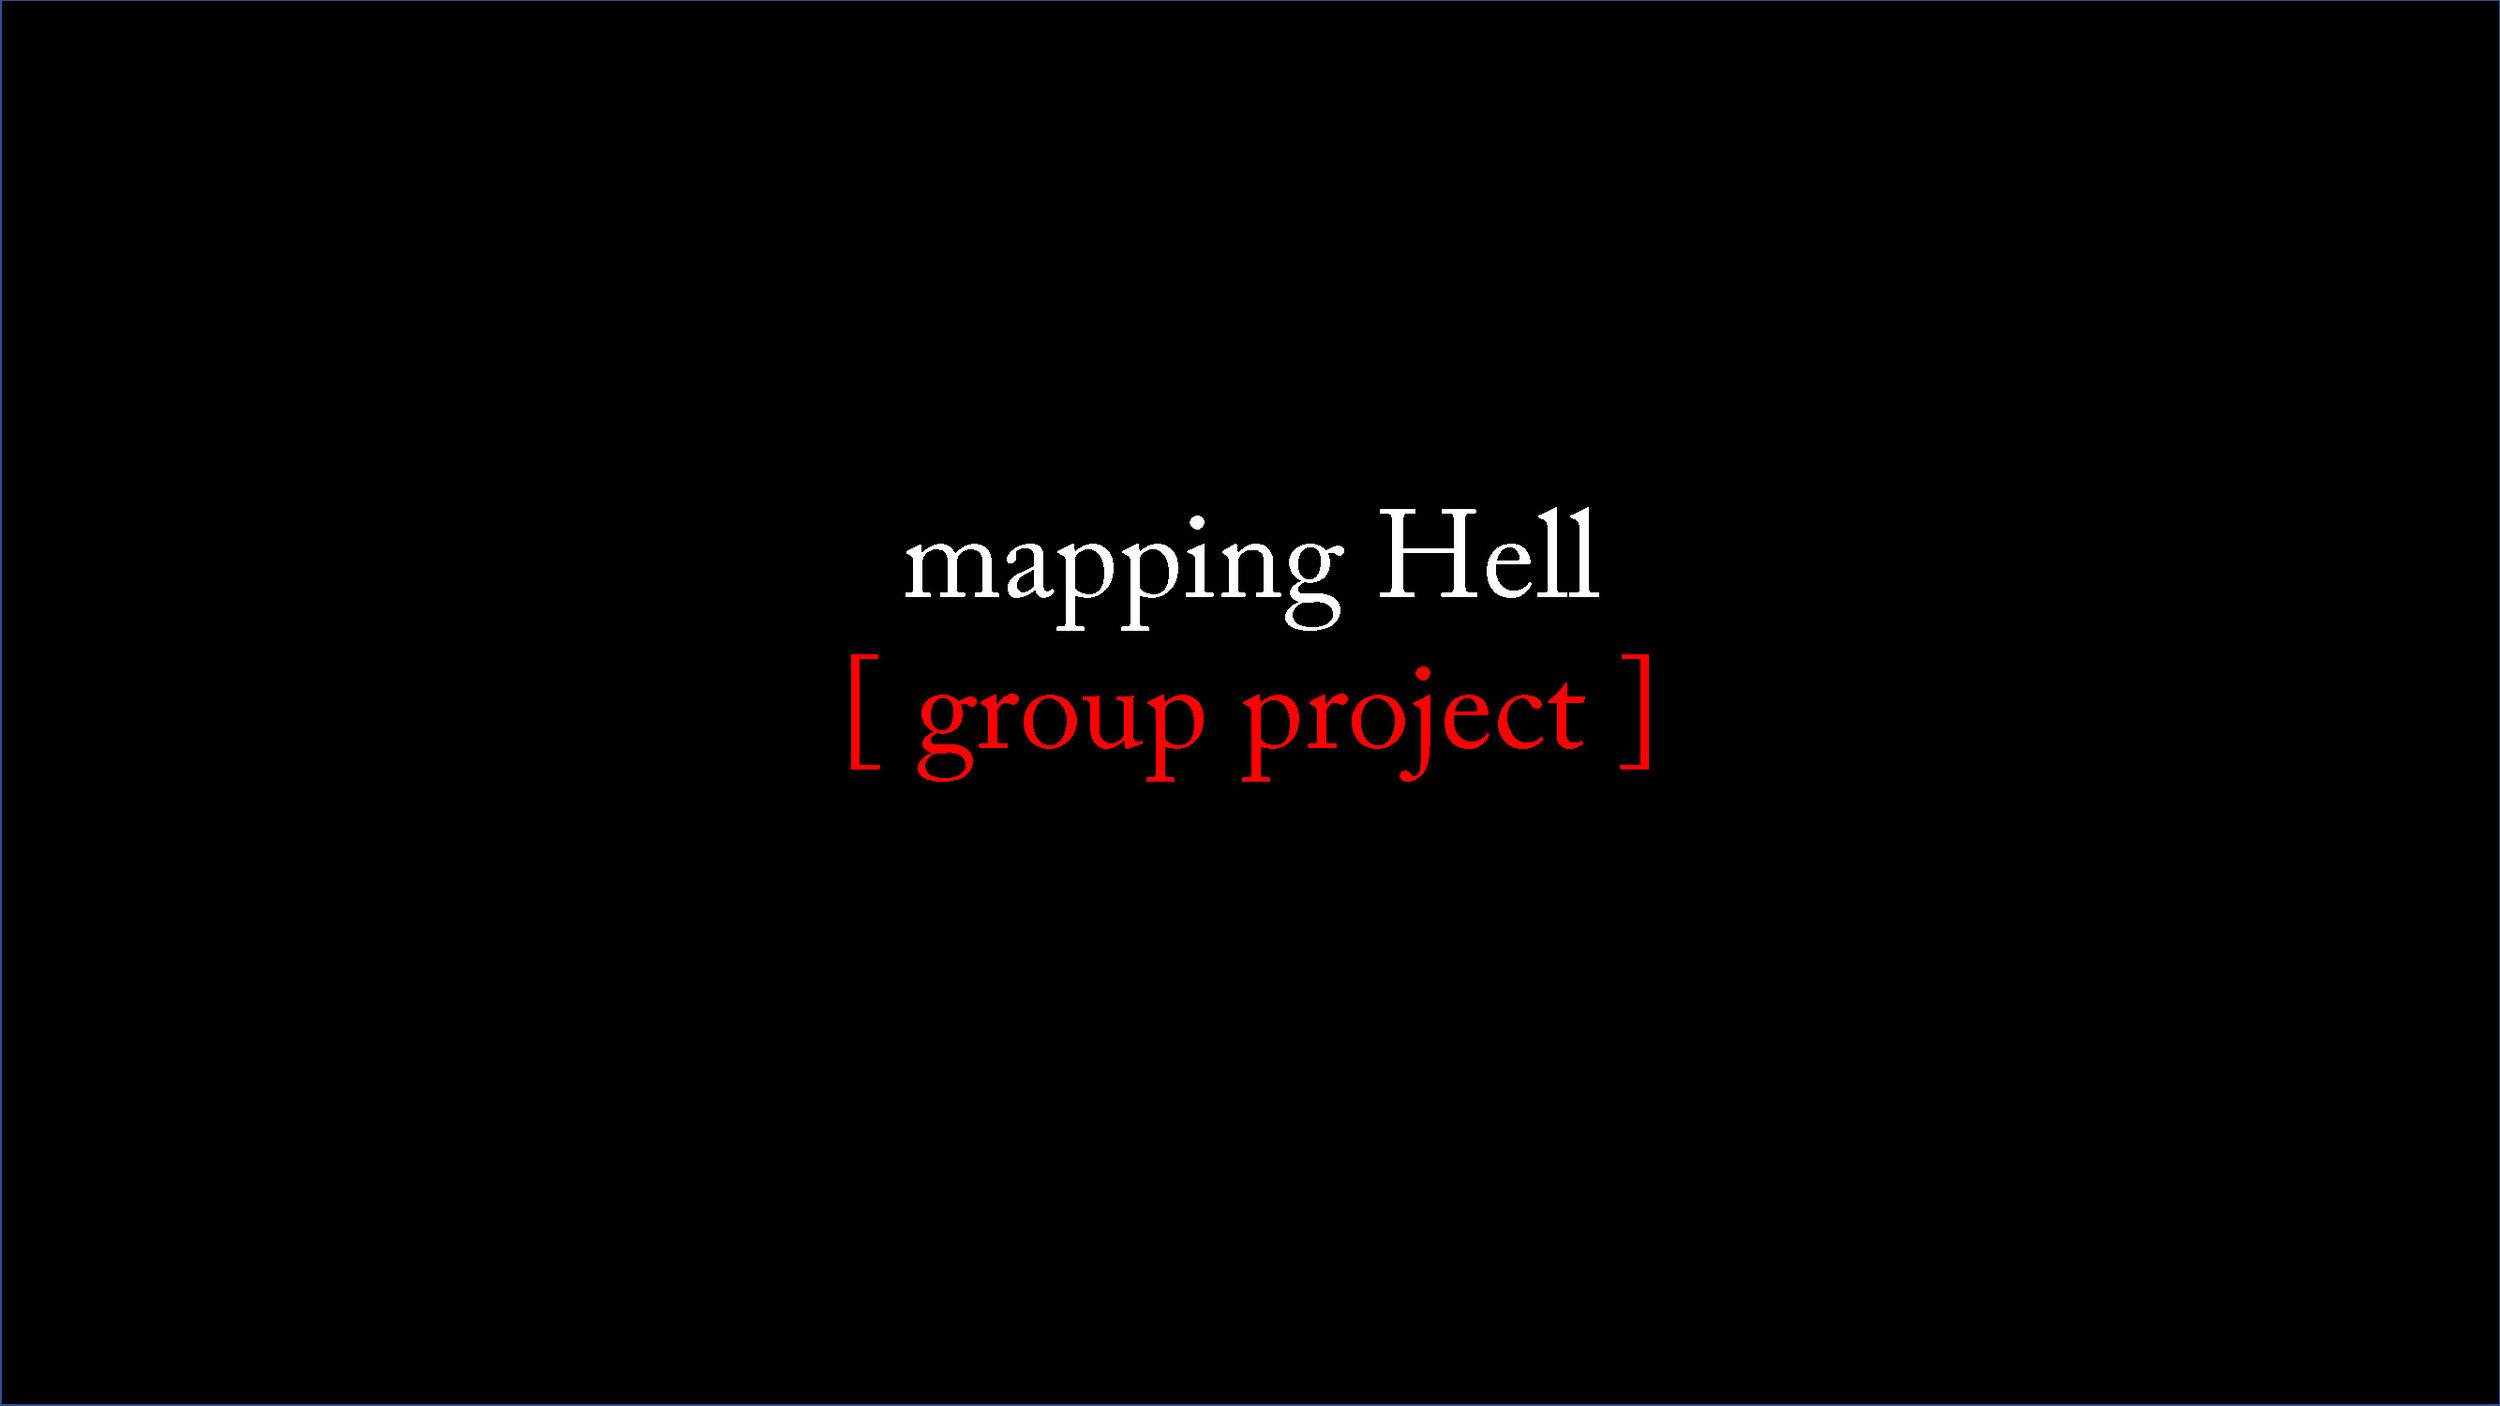 Illustrating Dante's Inferno_Infosession_Full Program_Page_33.jpg